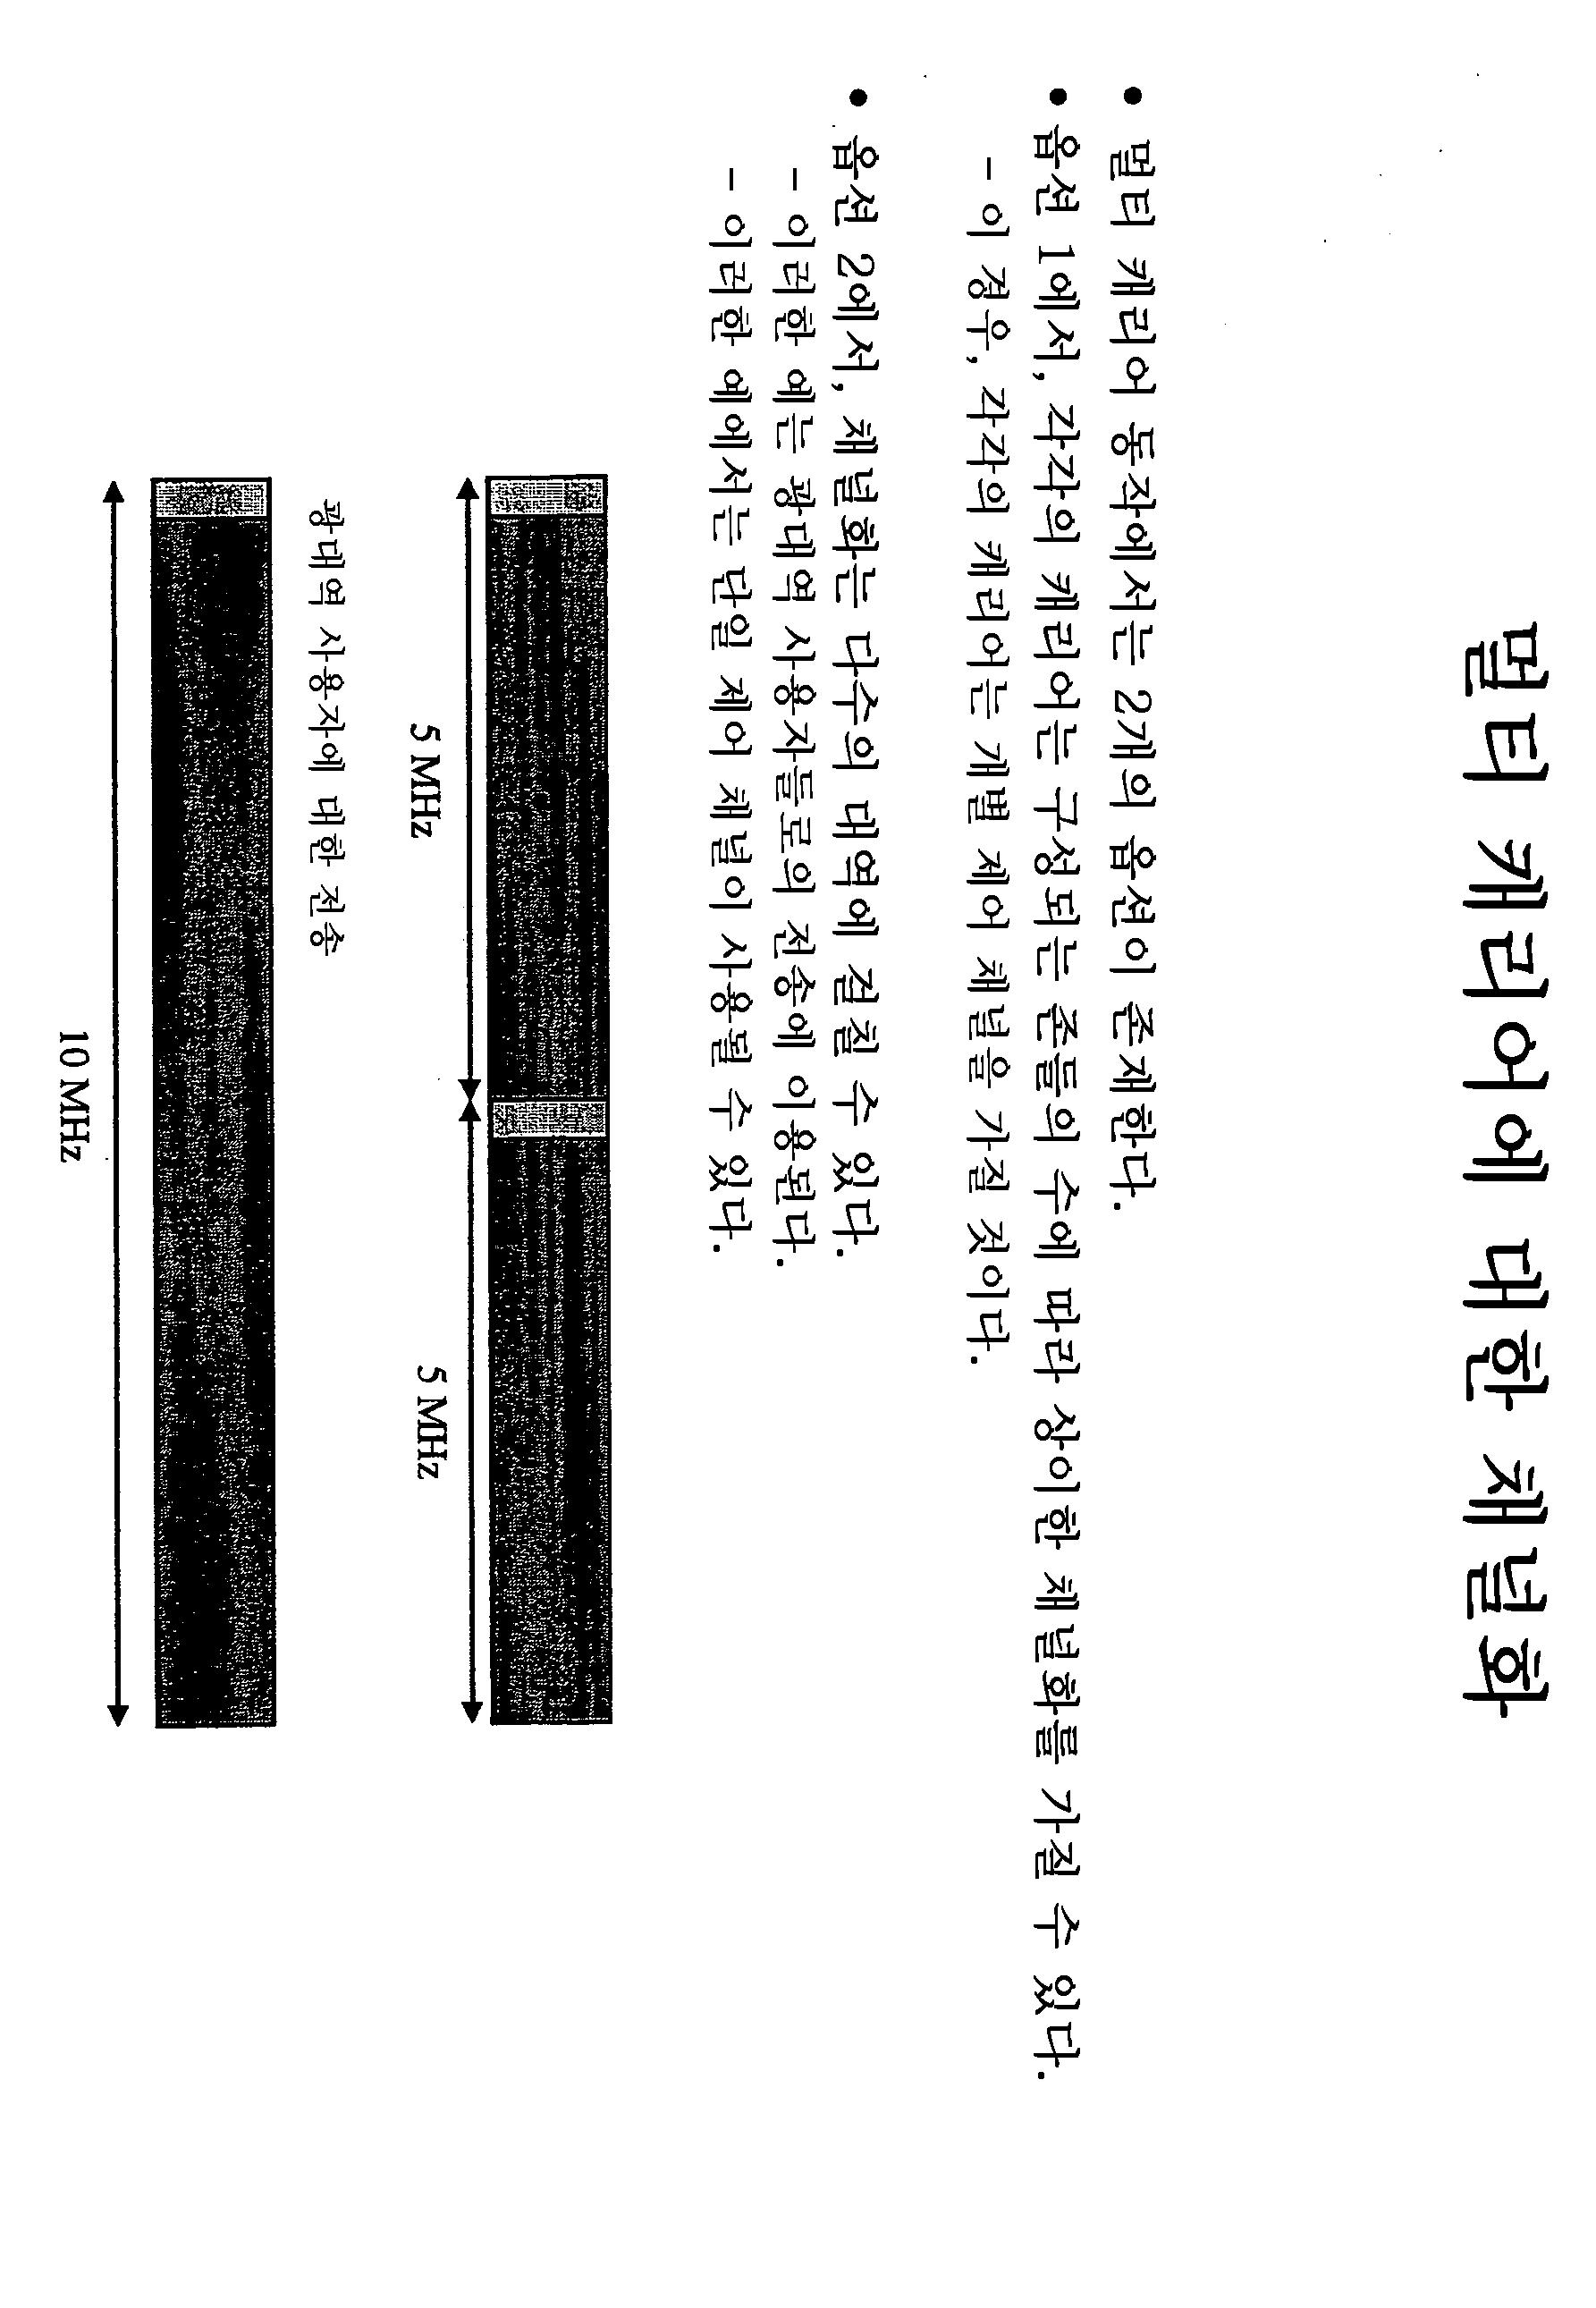 Figure 112014031700415-pat00057